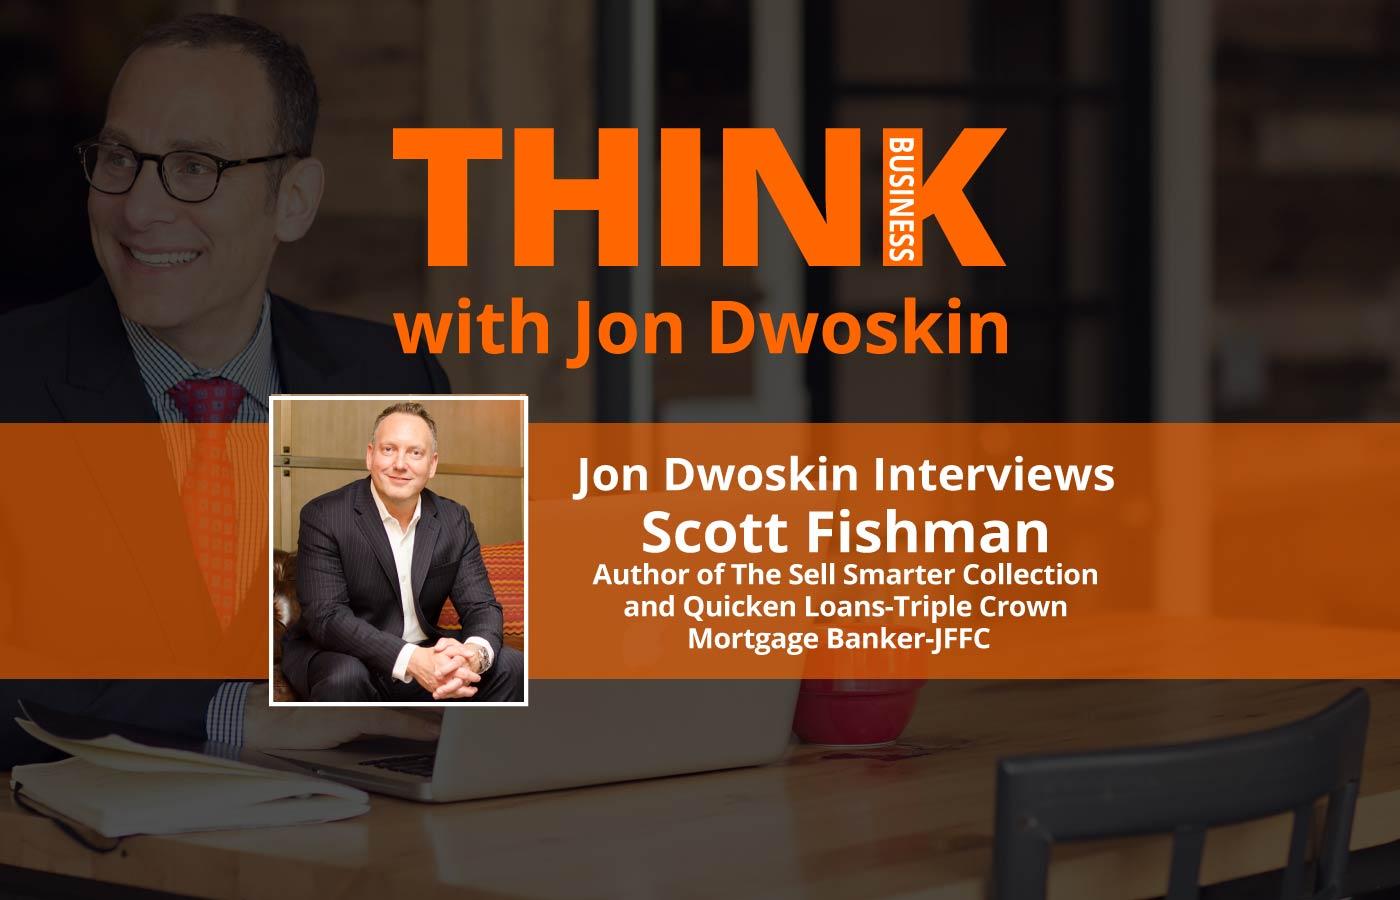 THINK Business: Jon Dwoskin Interviews Scott Fishman, CEO, 30 Minute Sales Coach